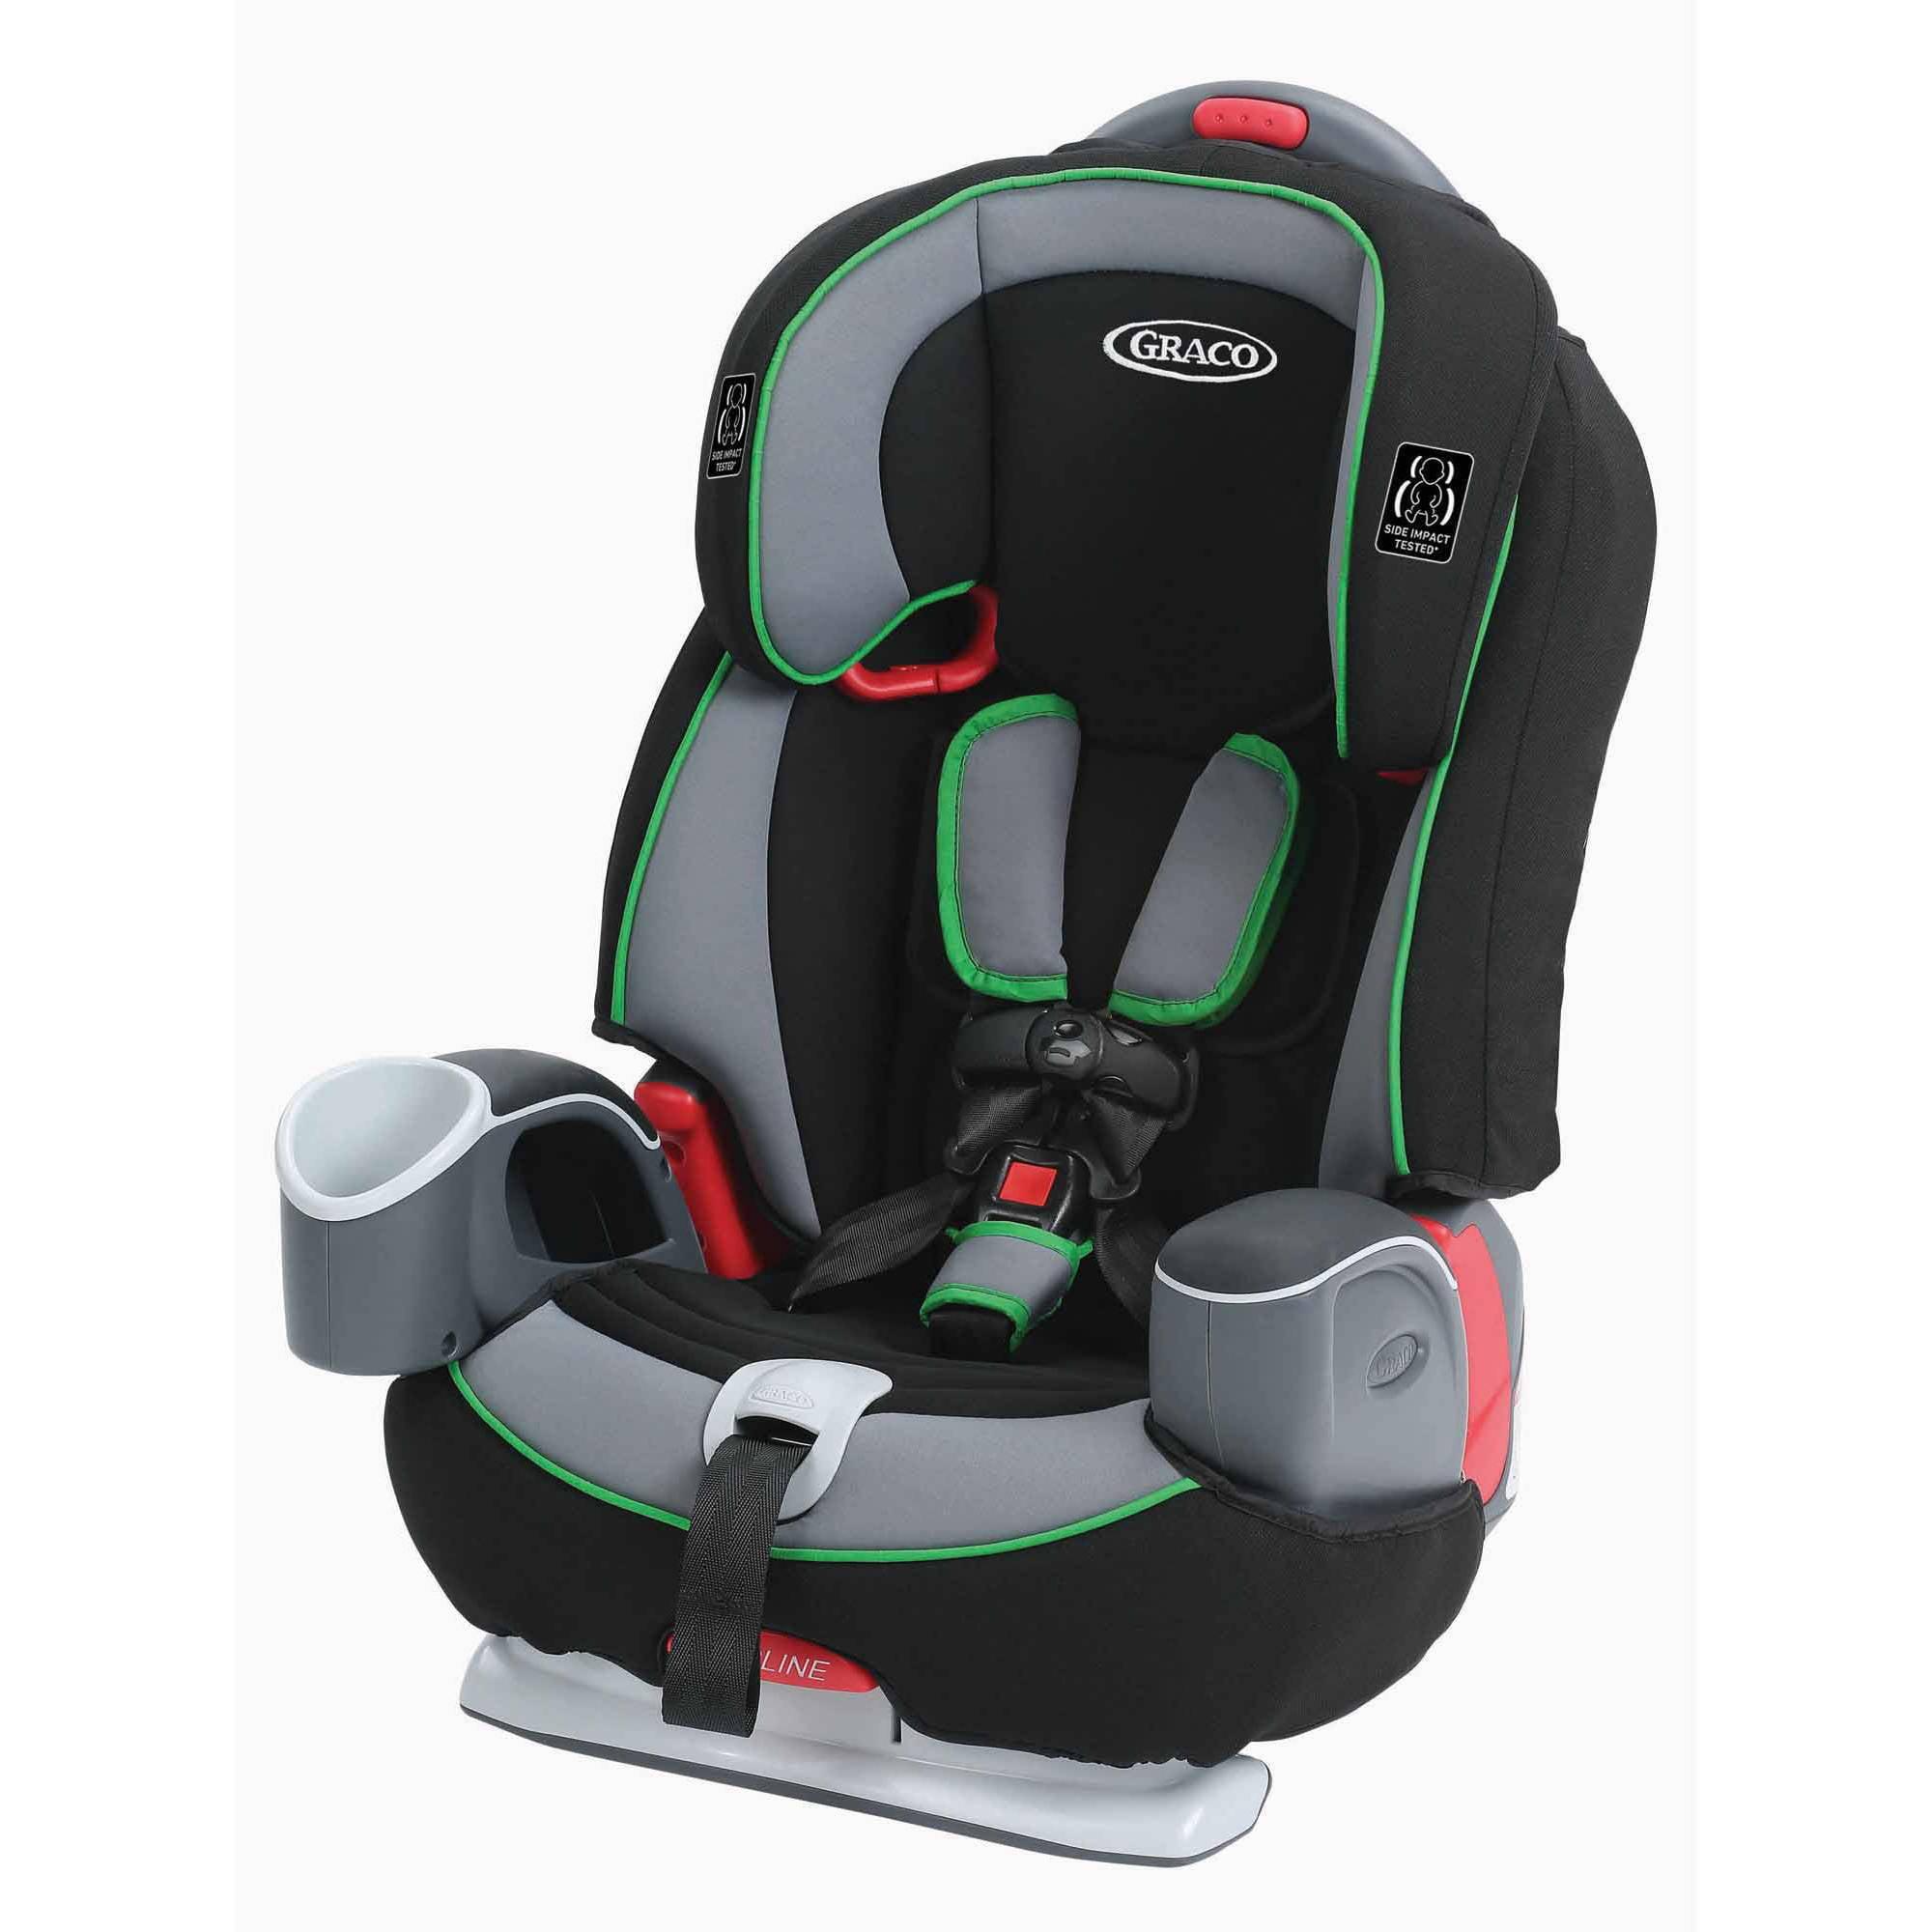 Graco Nautilus 65 3-in-1 Harness Booster Car Seat, Fern